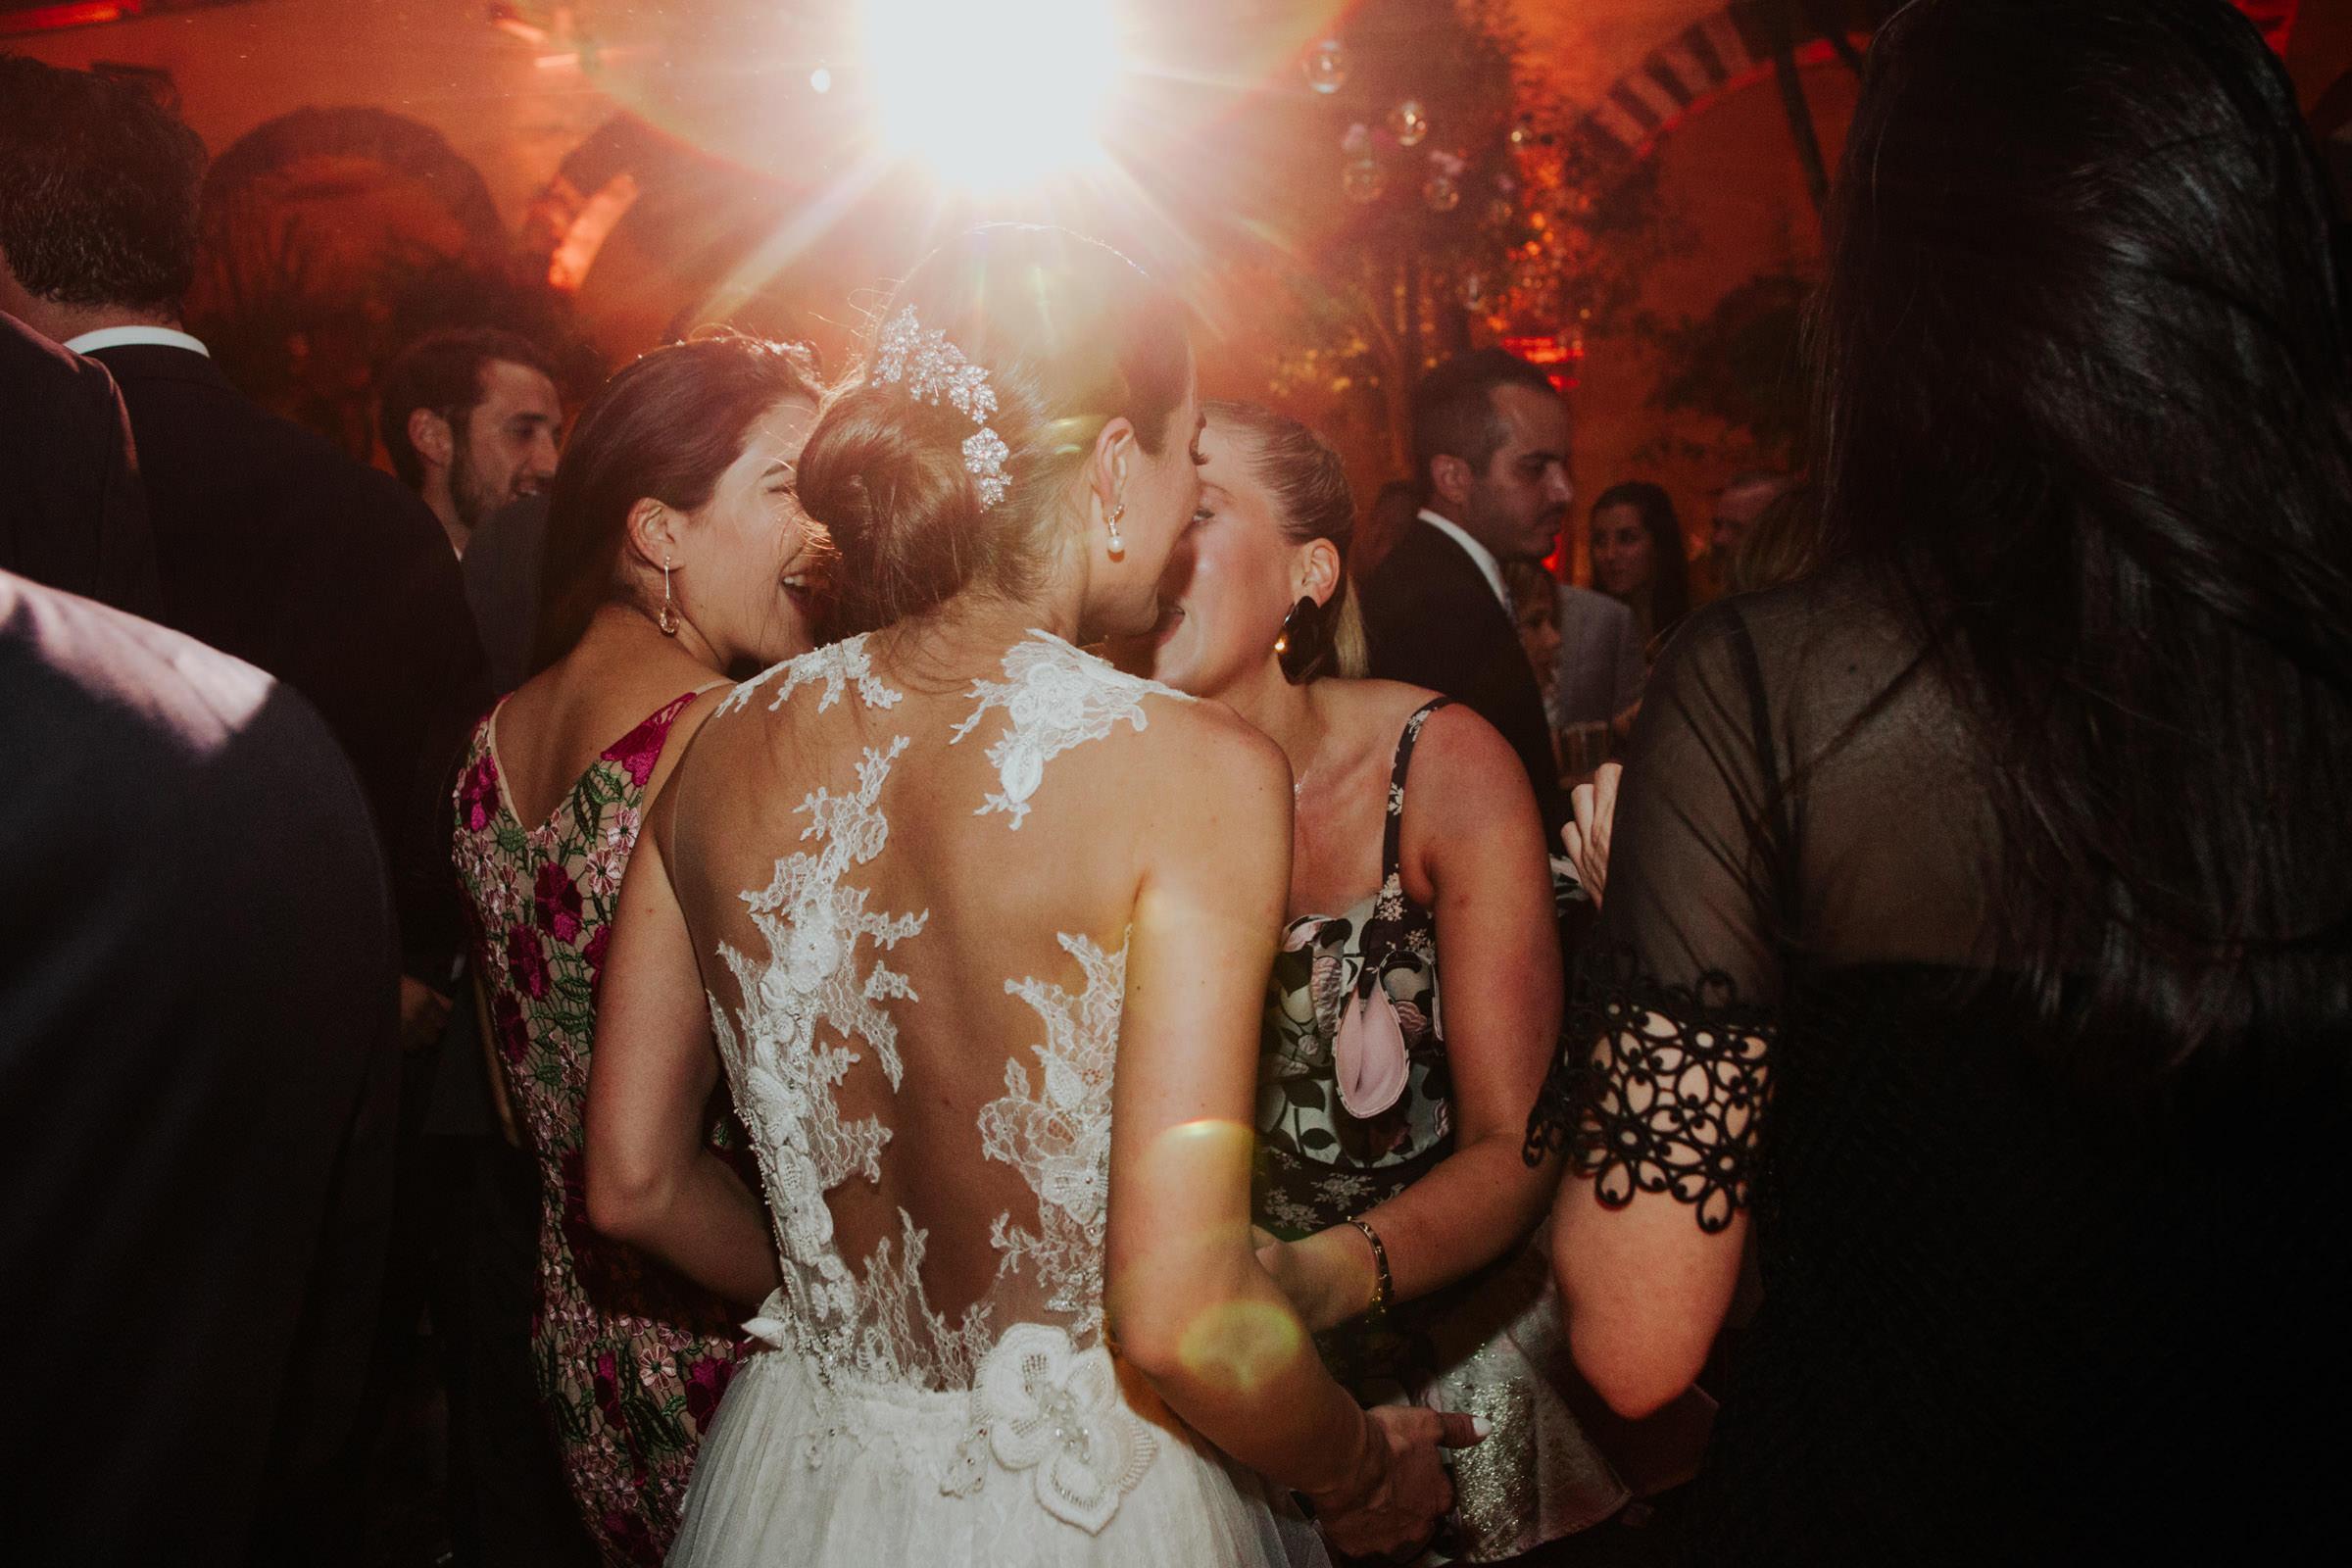 San-Miguel-de-Allende-Wedding-Photography-Parroquia-Instituto-Boda-Fotografia-Fer-Sergio-Pierce-Lifestyle-Photography0049.JPG